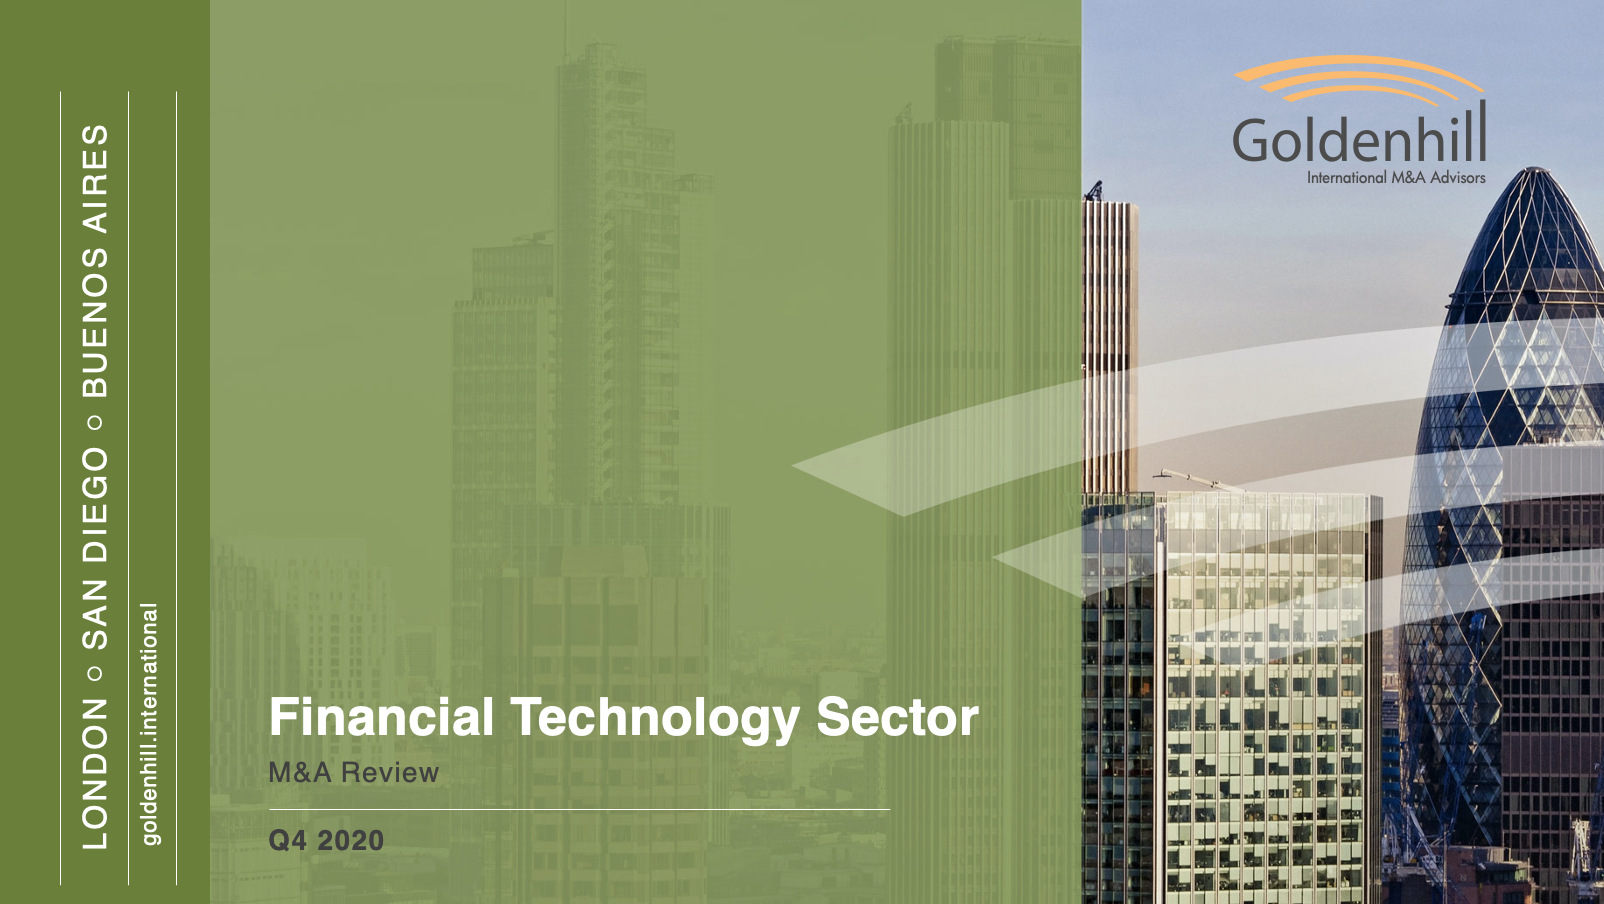 Q4 FinTech Cover Page